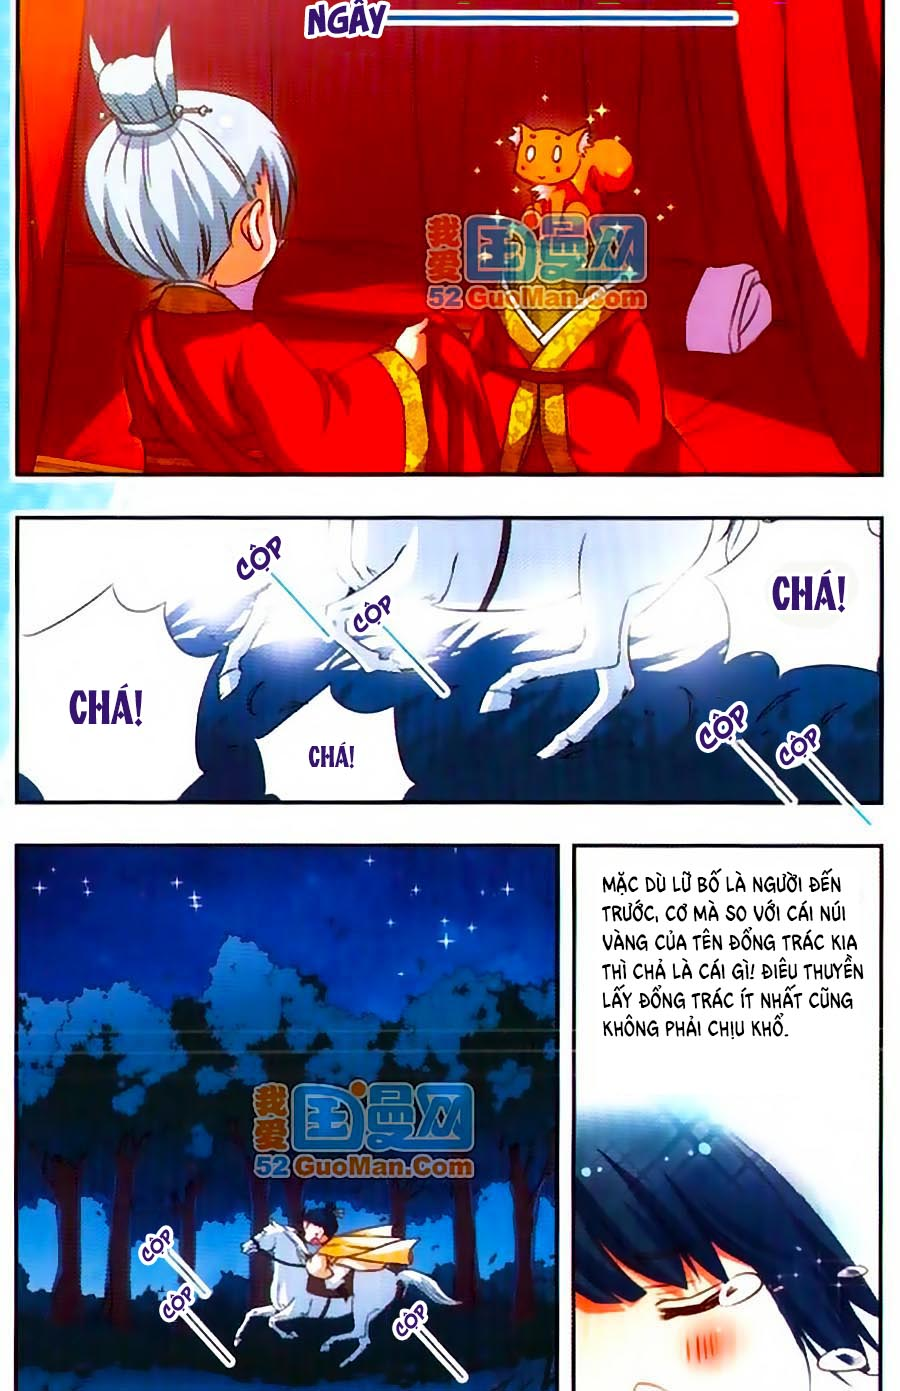 Manh Tam Quốc Chap 58.3 - Next Chap 59